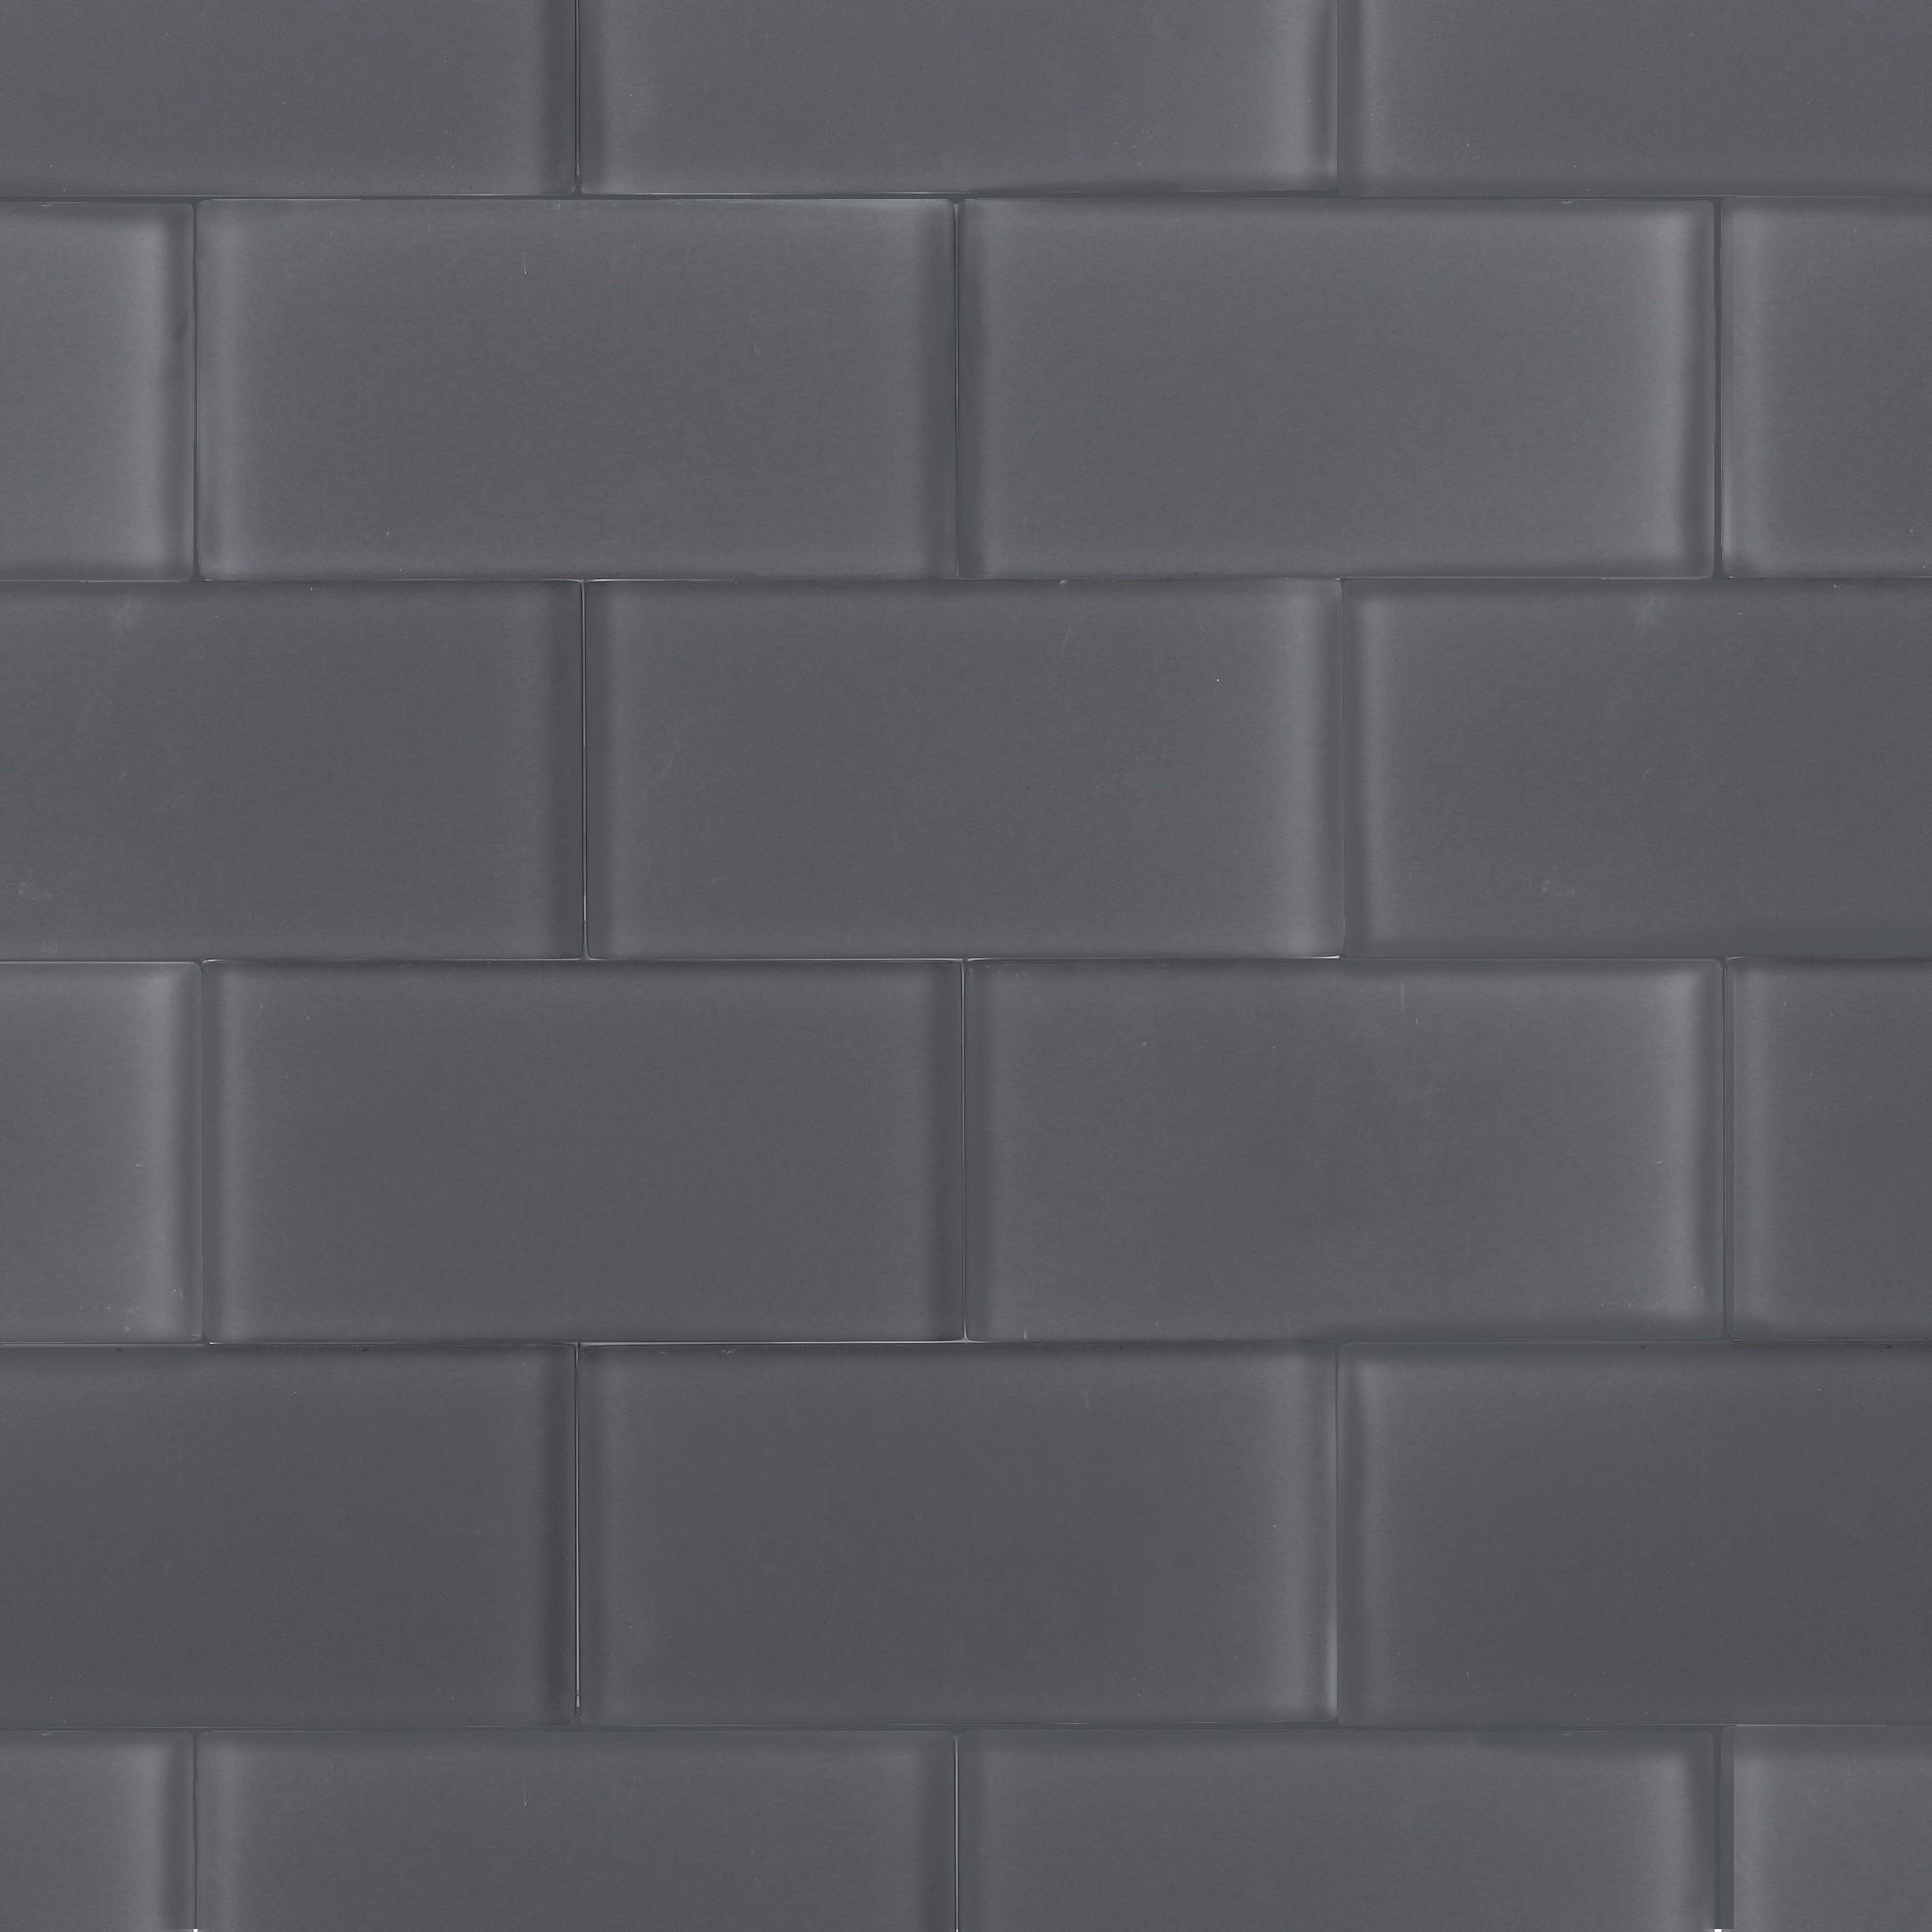 Loft ash gray frosted 3x6 glass tile - Frosted glass backsplash ...